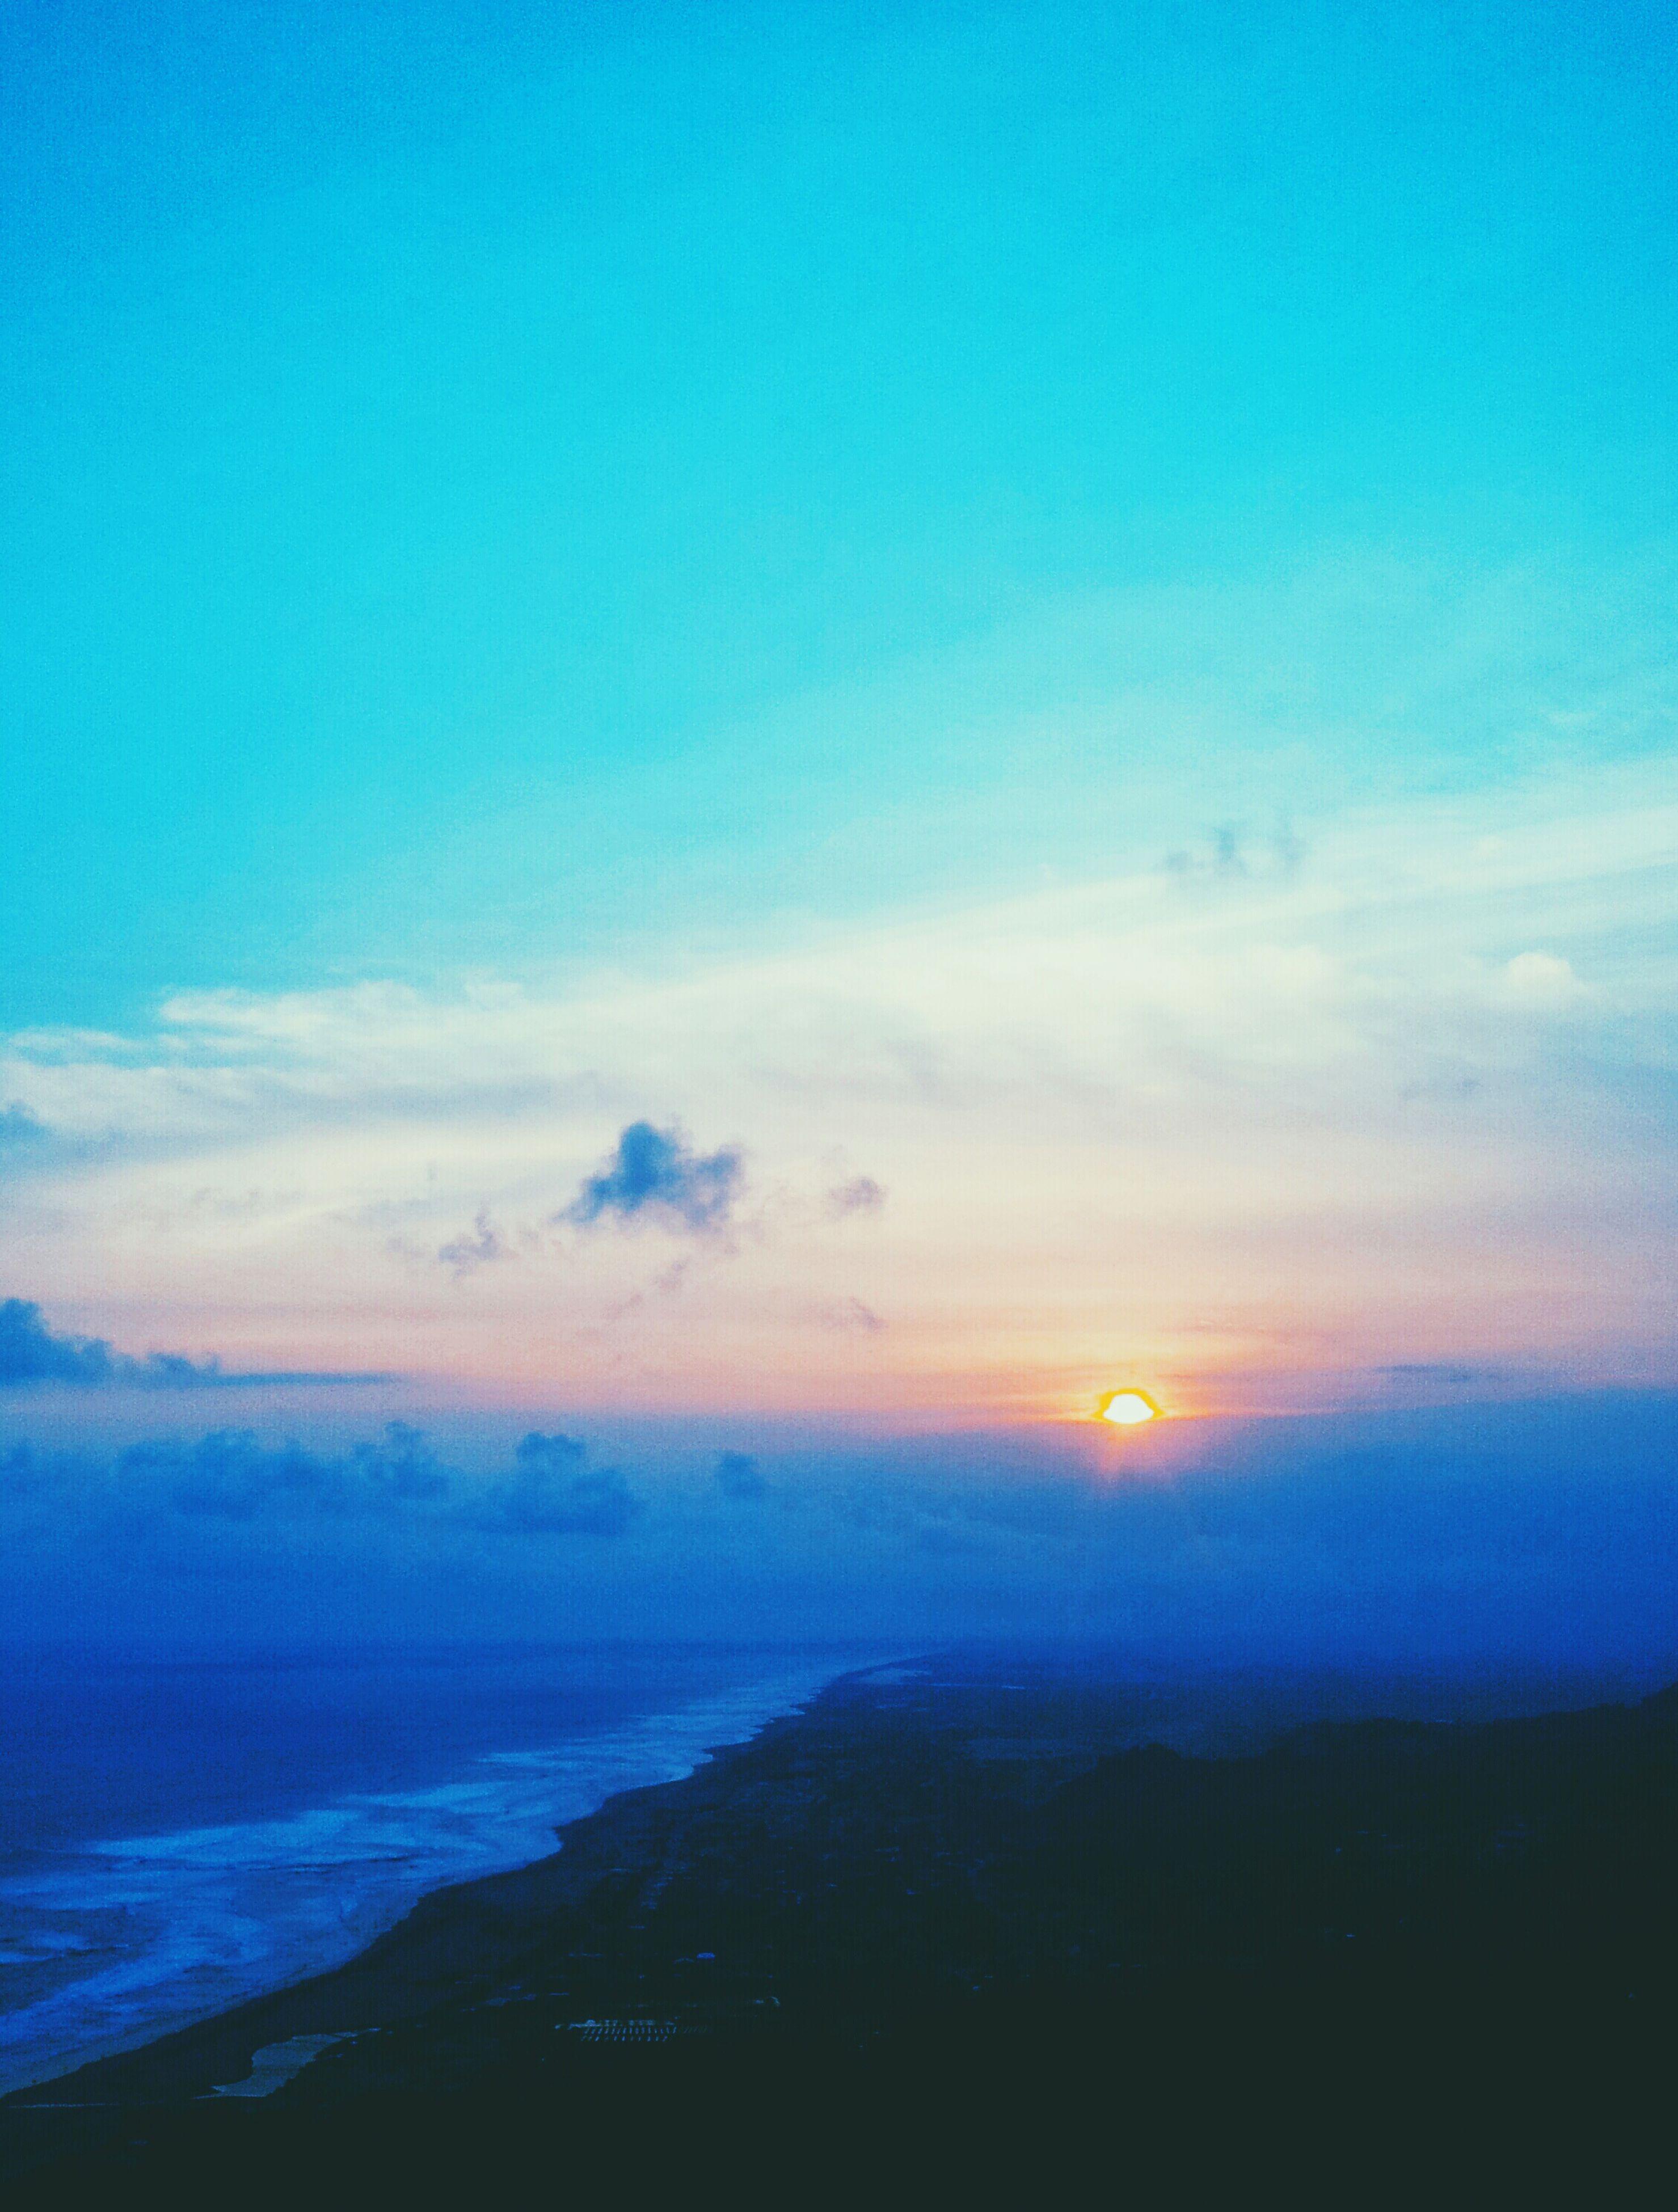 scenics, tranquil scene, tranquility, beauty in nature, sunset, sky, blue, nature, idyllic, silhouette, copy space, cloud - sky, landscape, mountain, sun, sunlight, cloud, outdoors, non-urban scene, majestic